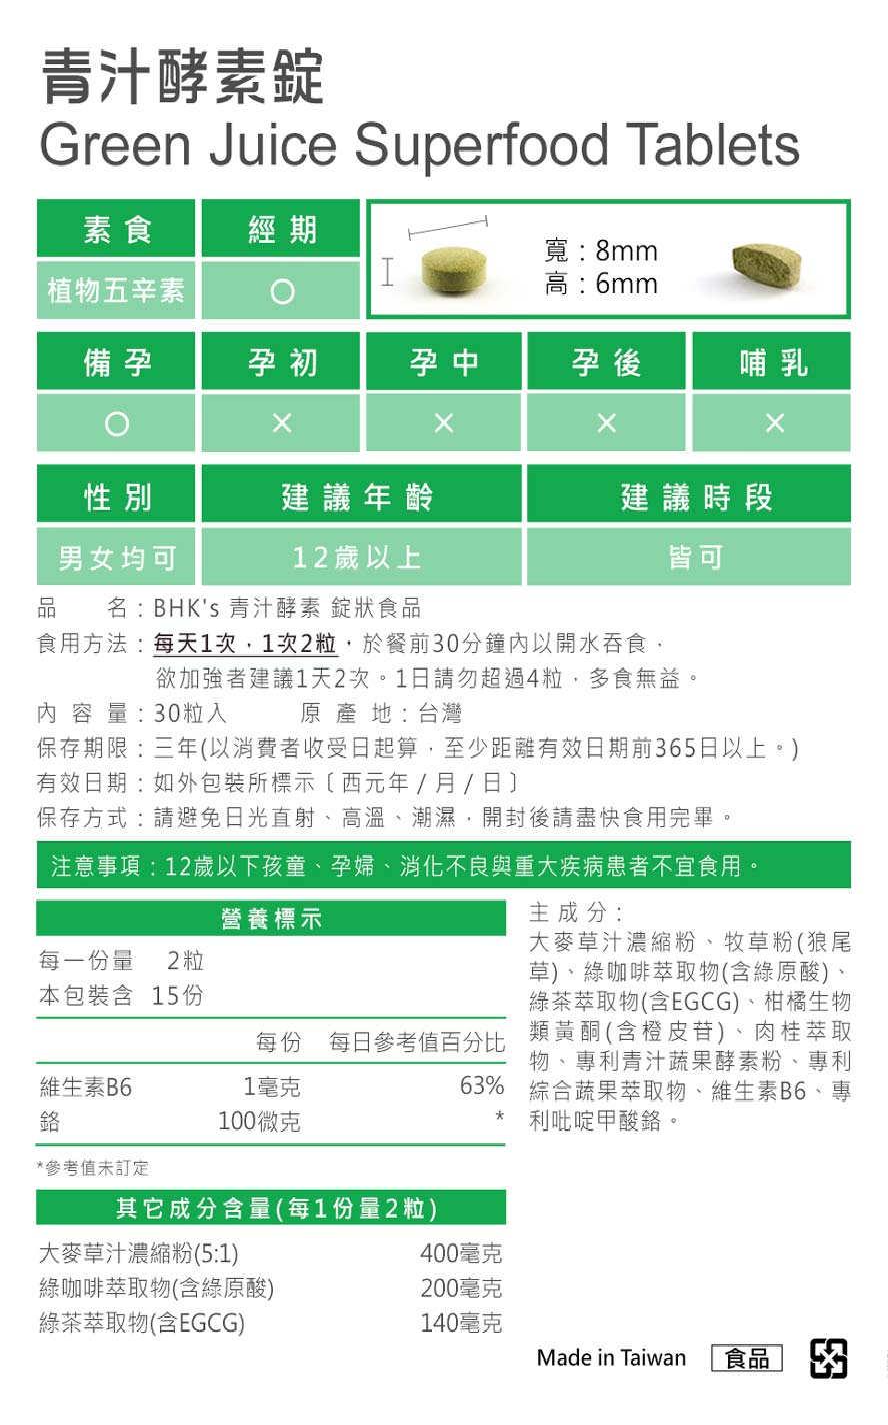 BHK's青汁酵素錠通過安全檢驗,安全無慮,無副作用。